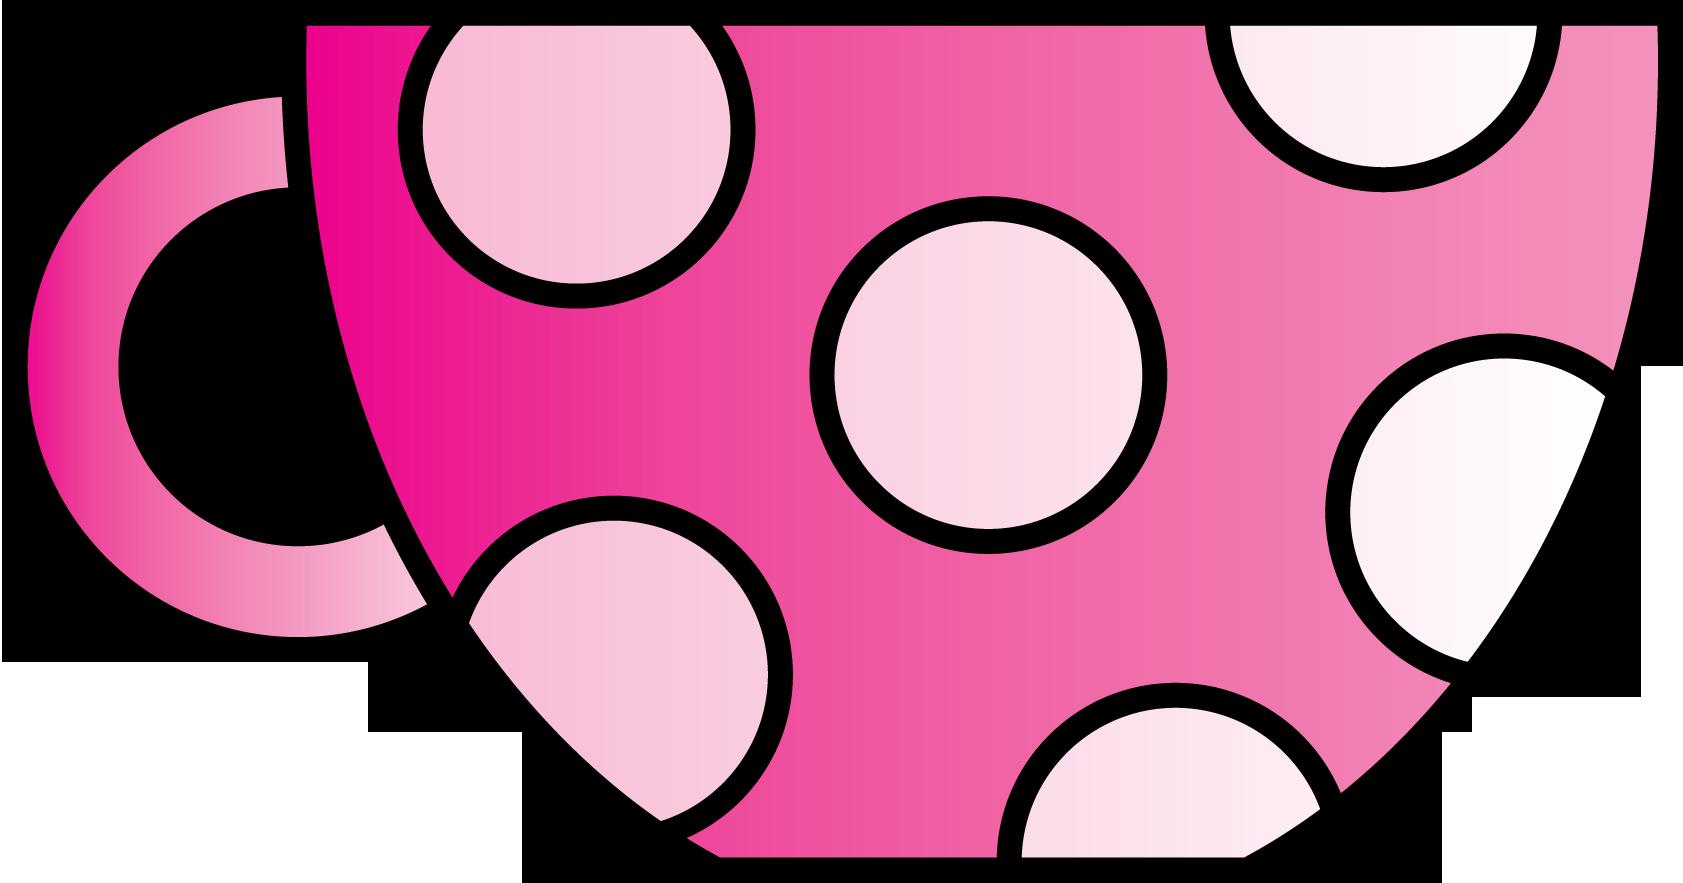 Clipart freebie vector library library Pink Polkadot Teacup Clipart Freebie   revidevi.wordpress.com vector library library